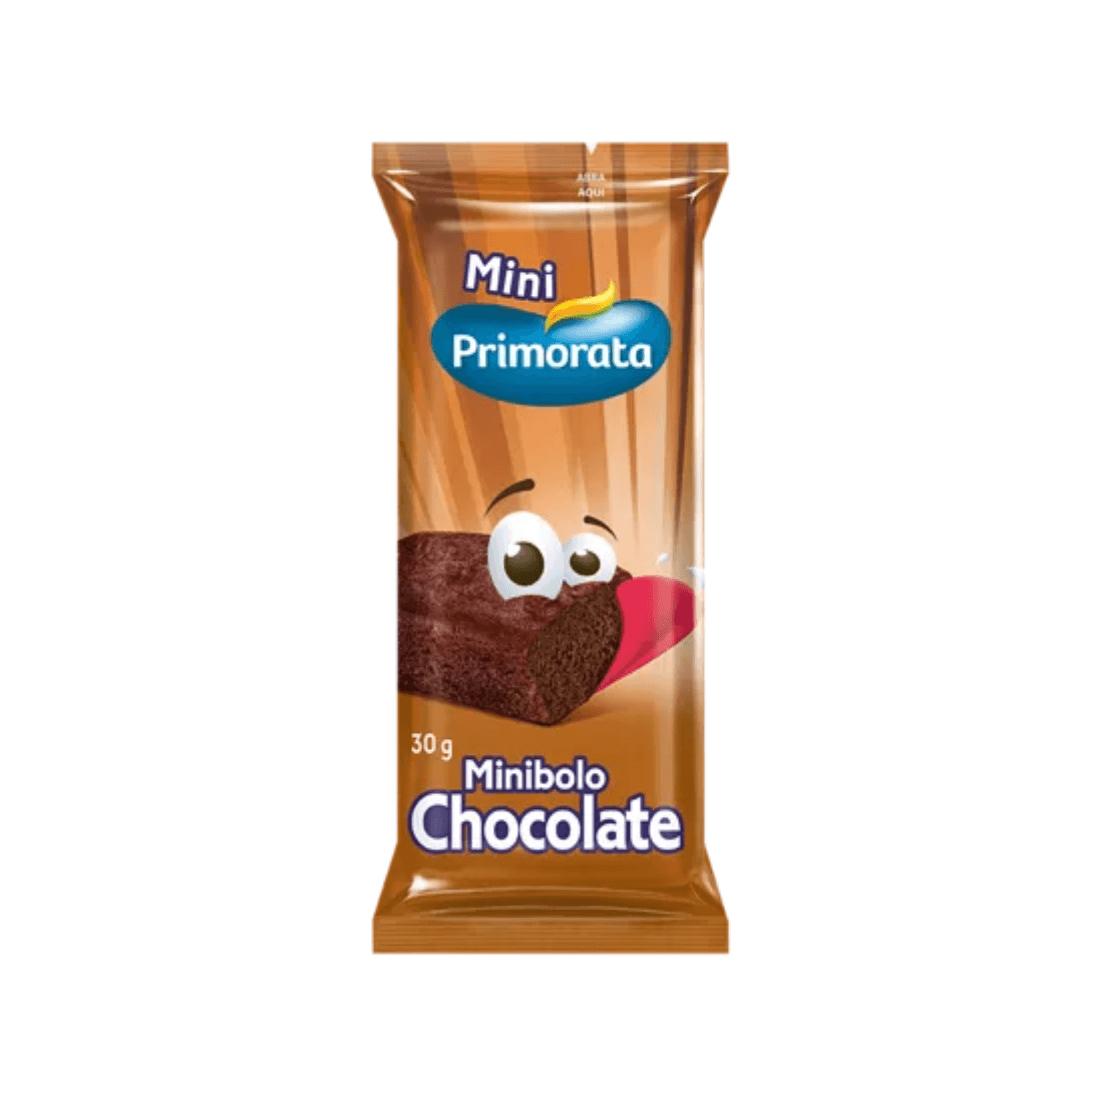 MINI BOLO CHOCOLATE PRIMORATA 30G CAIXA 18 UNIDADES